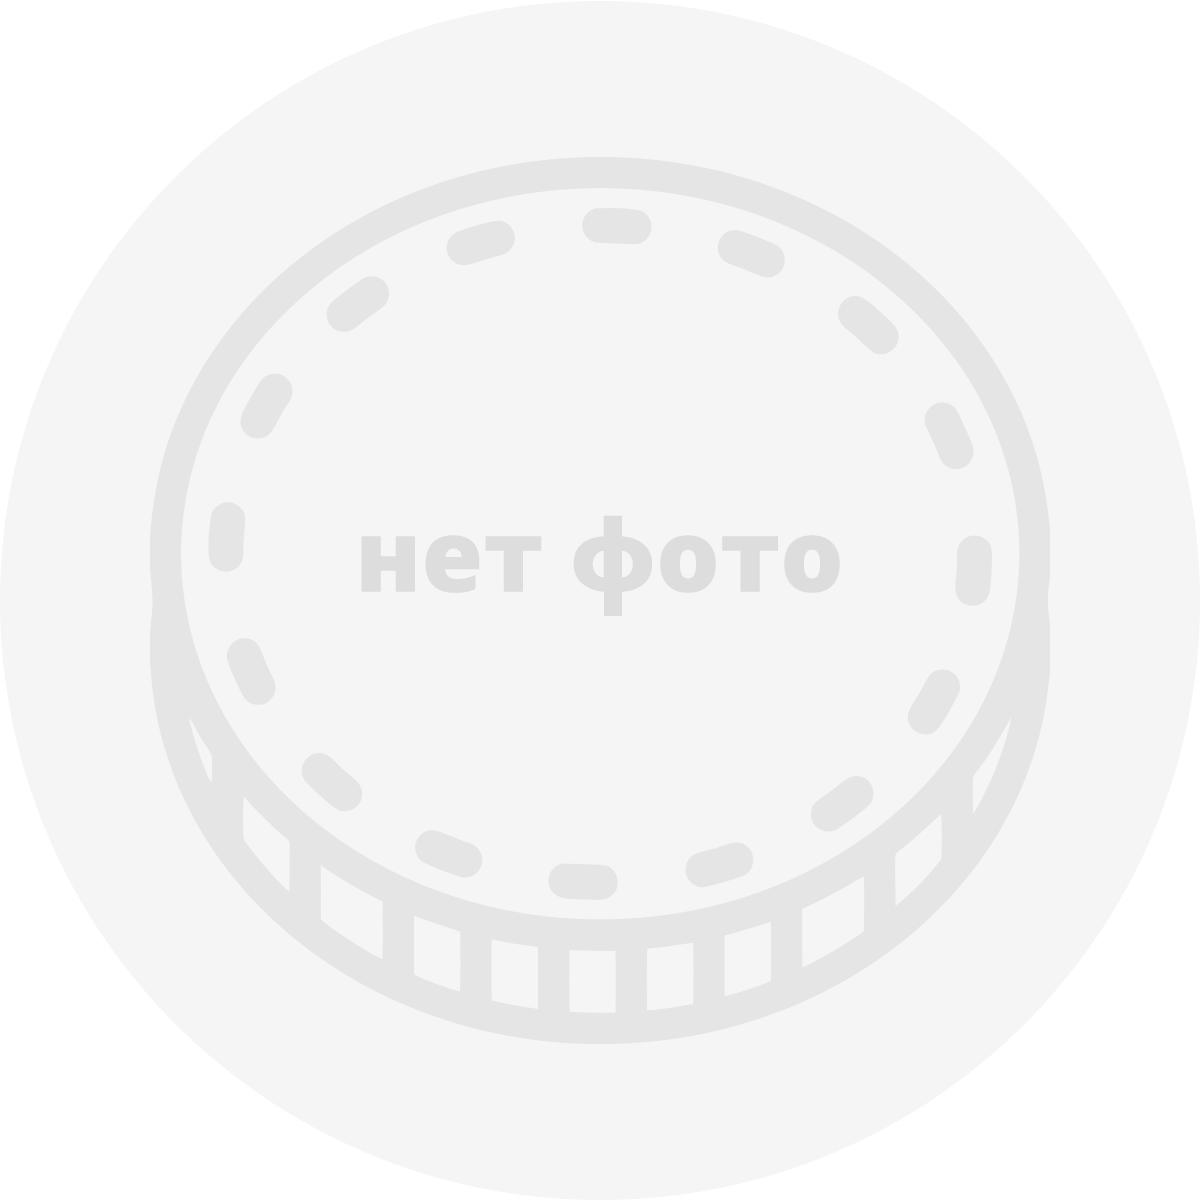 Республика Татарстан, 1 килограмм хлеба (1993 г.)